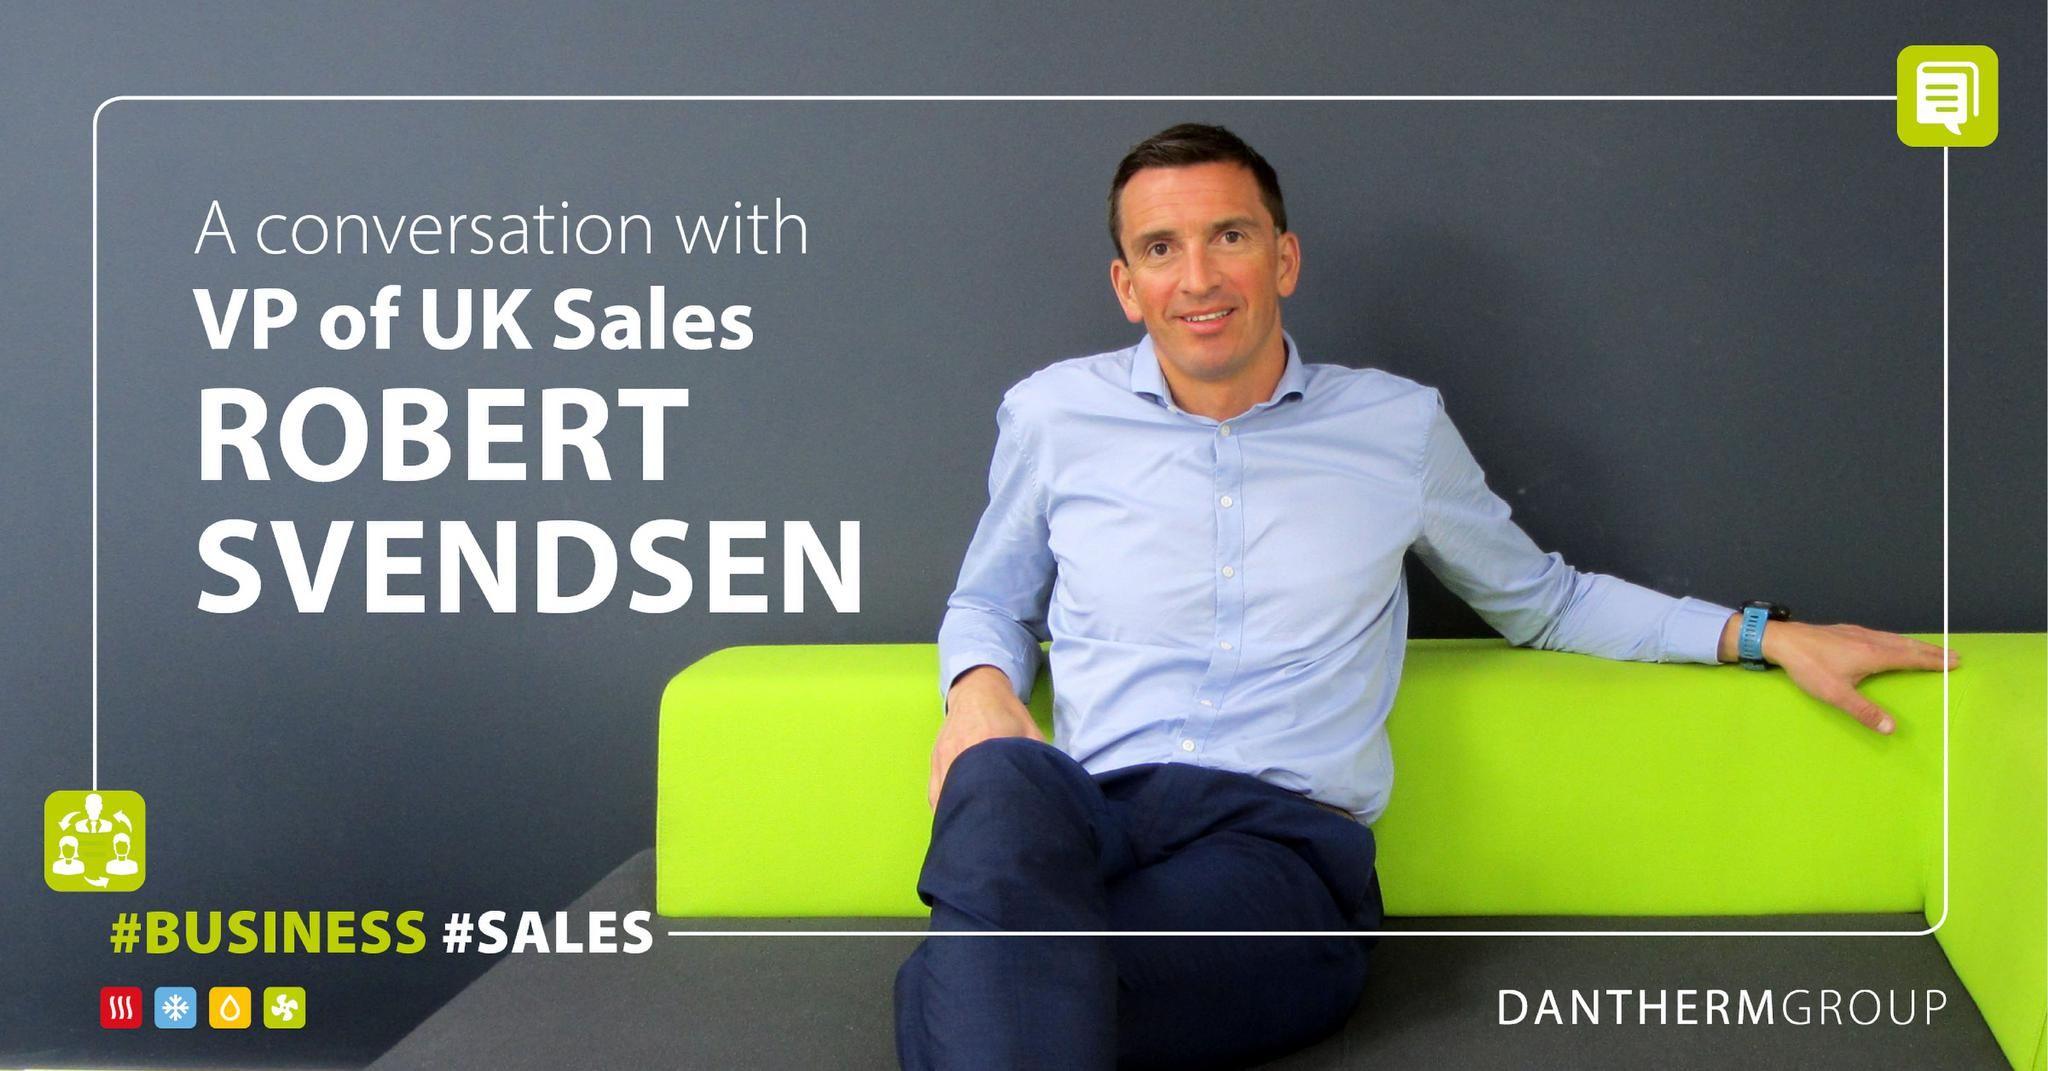 A conversation with VP of UK Sales Rob Svendsen